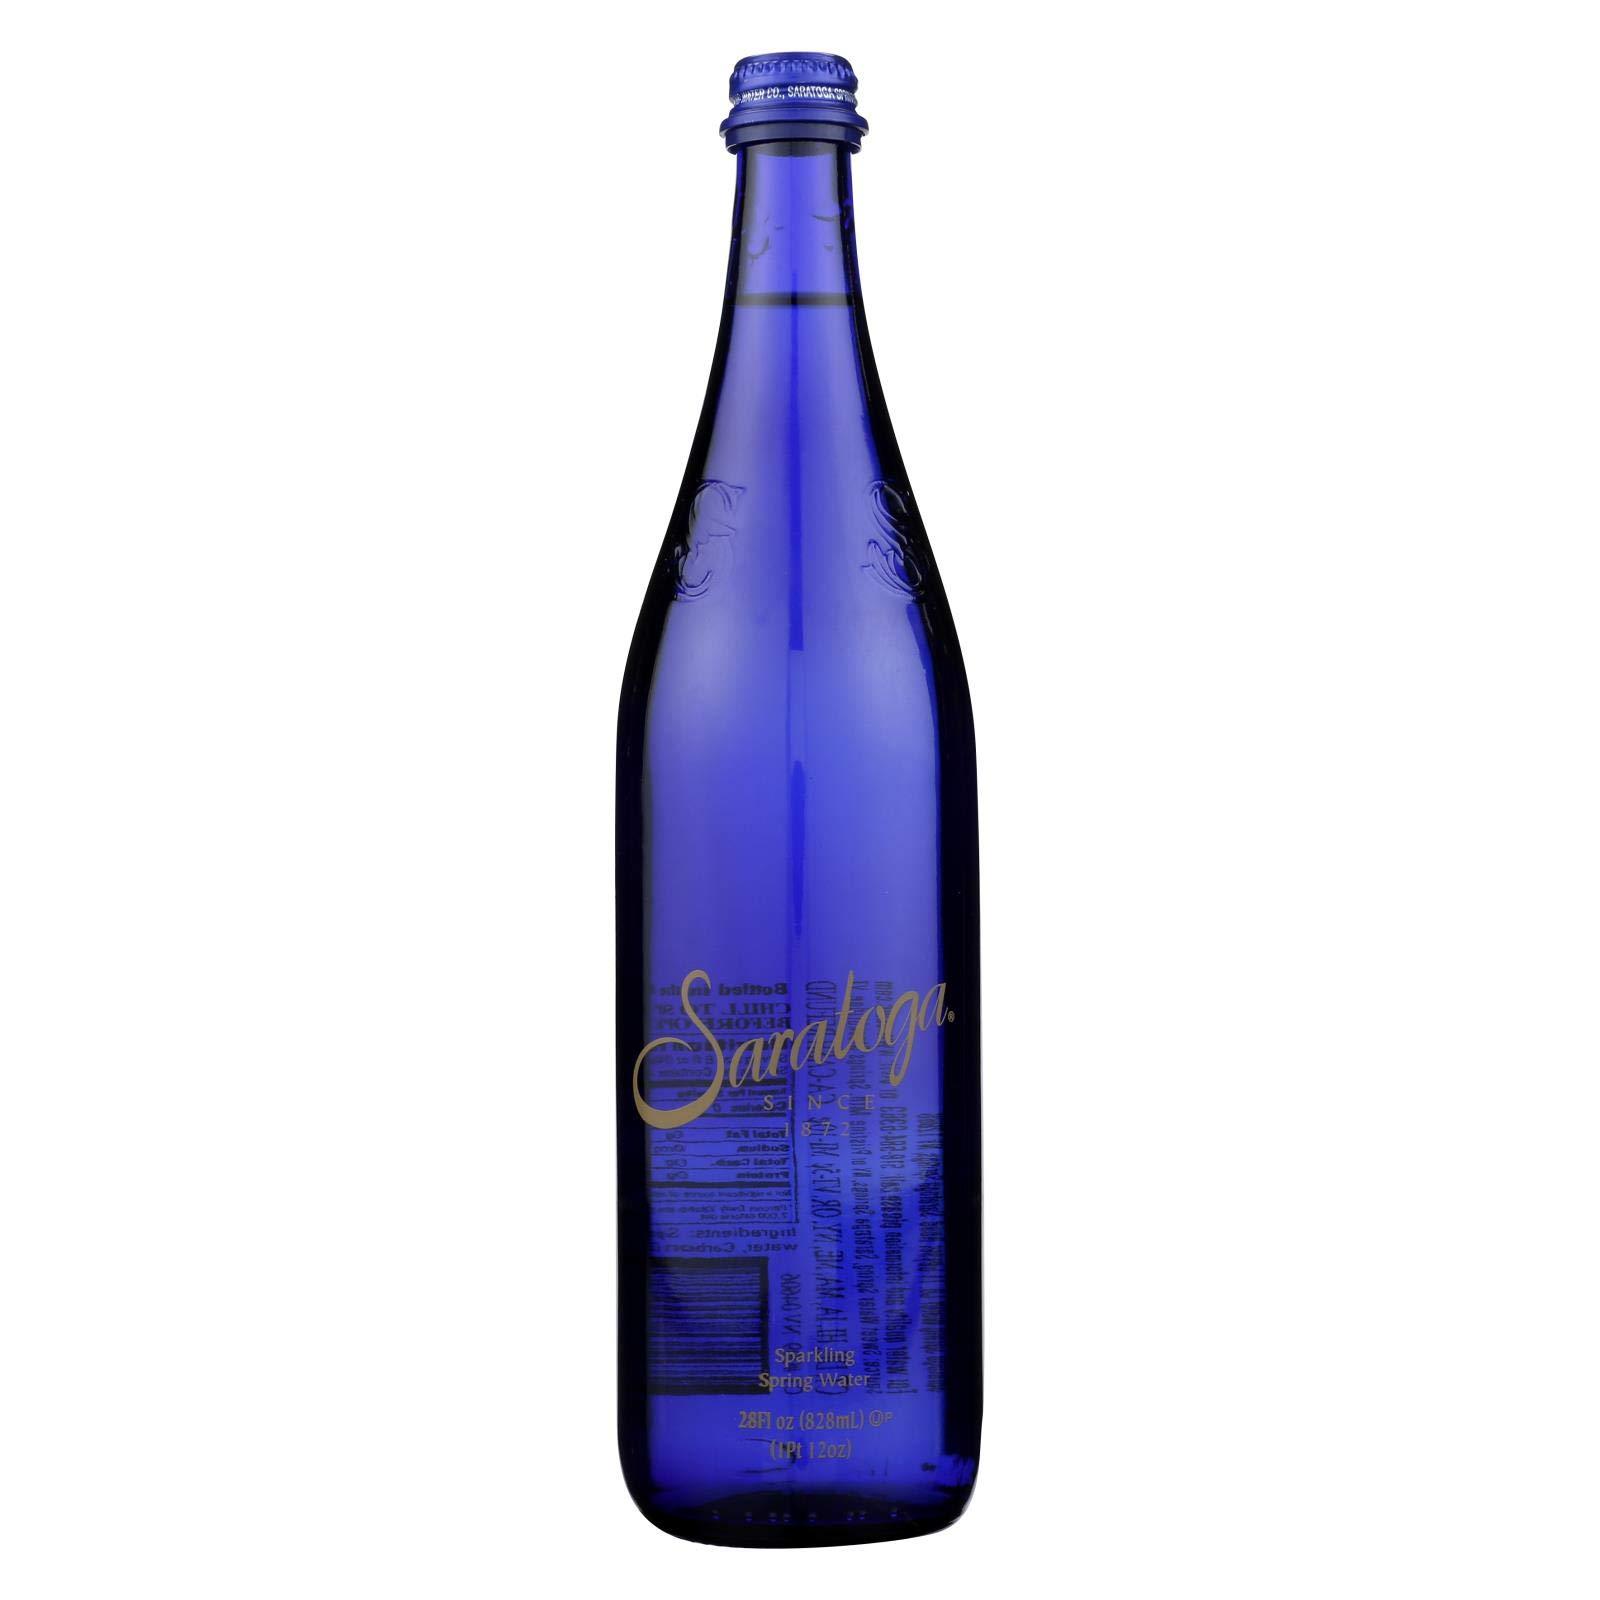 Saratoga Springs Water Sparkling Spring Water - Case of 12 - 28 Fl oz. by Saratoga Springs Water